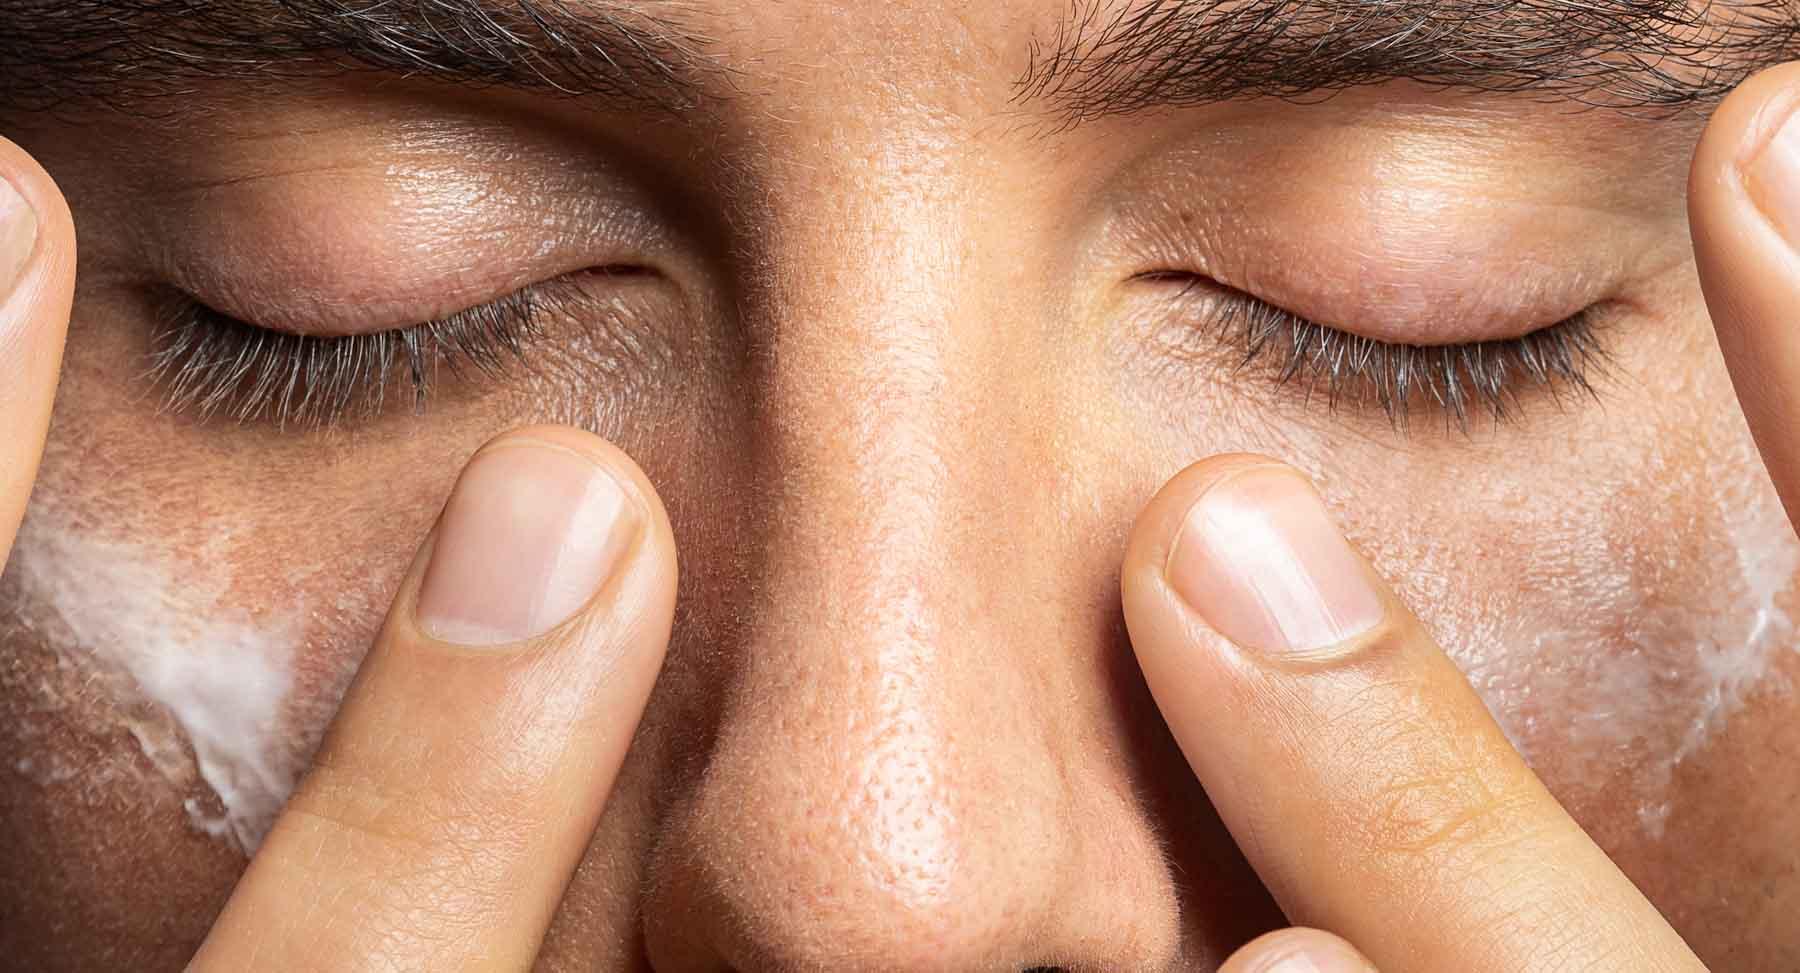 How to Take Care of Sun Damaged Skin